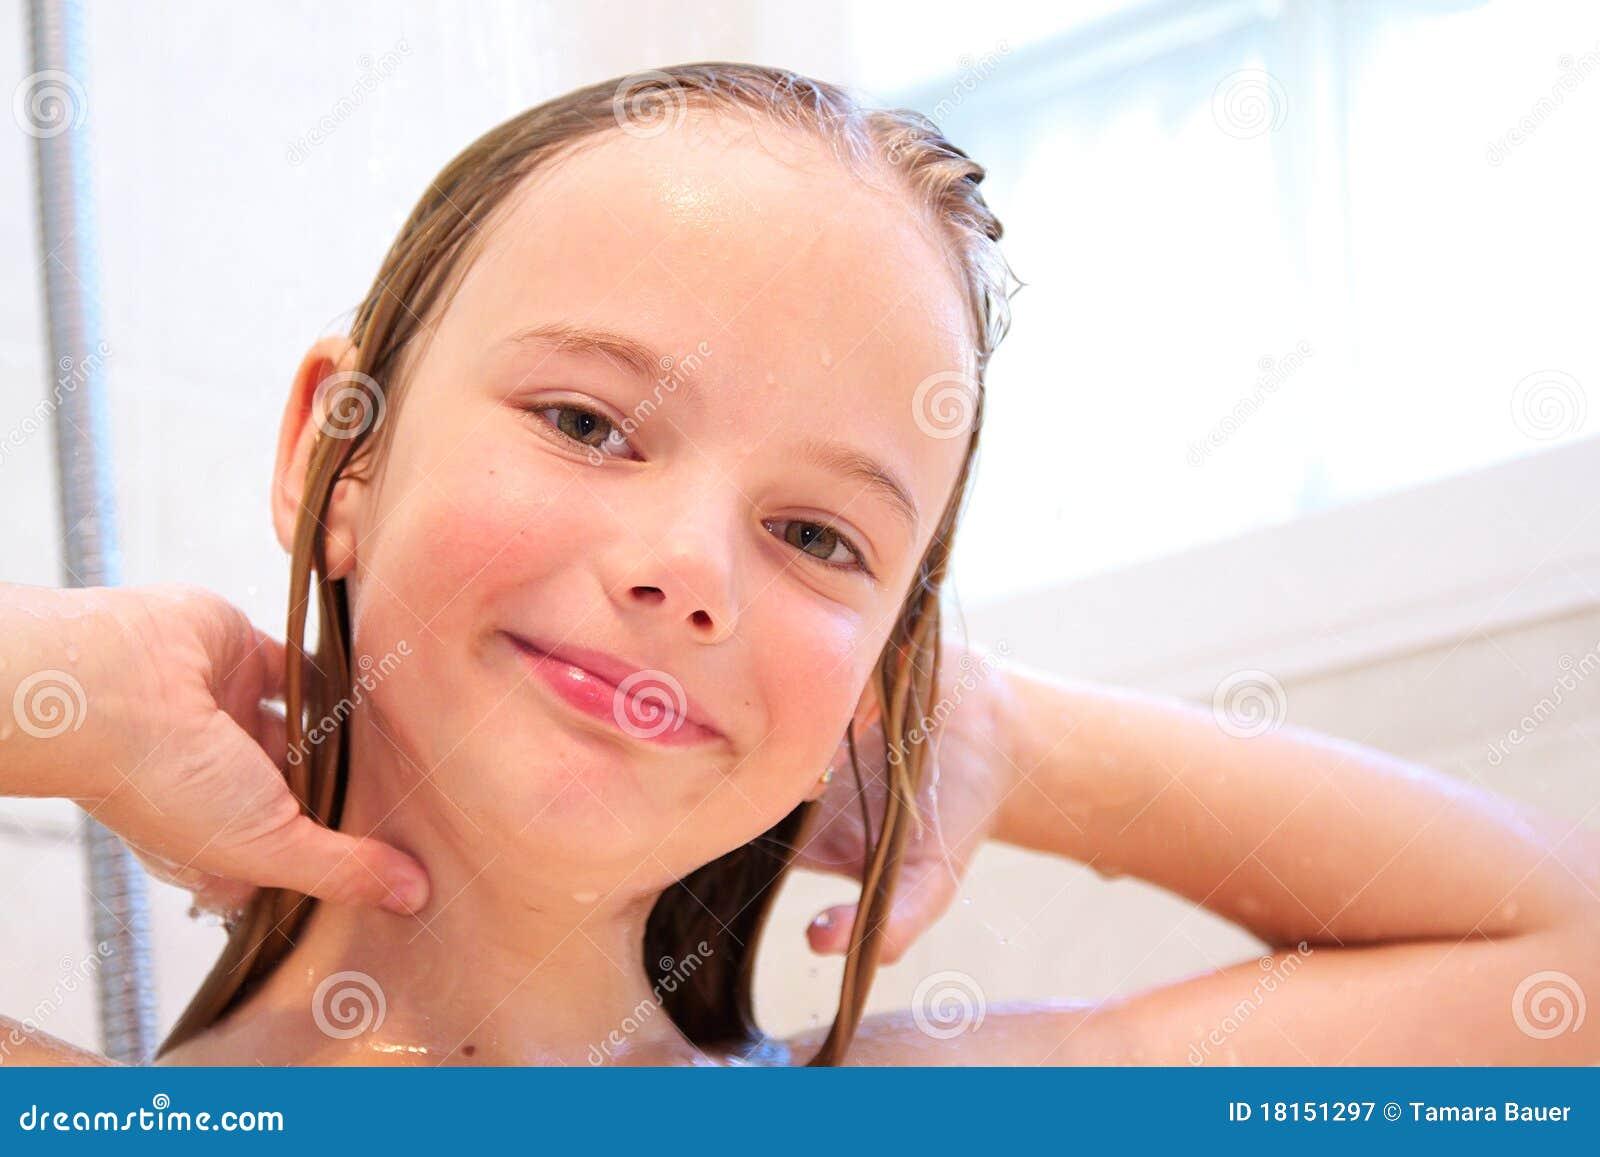 real teen daughter in dress